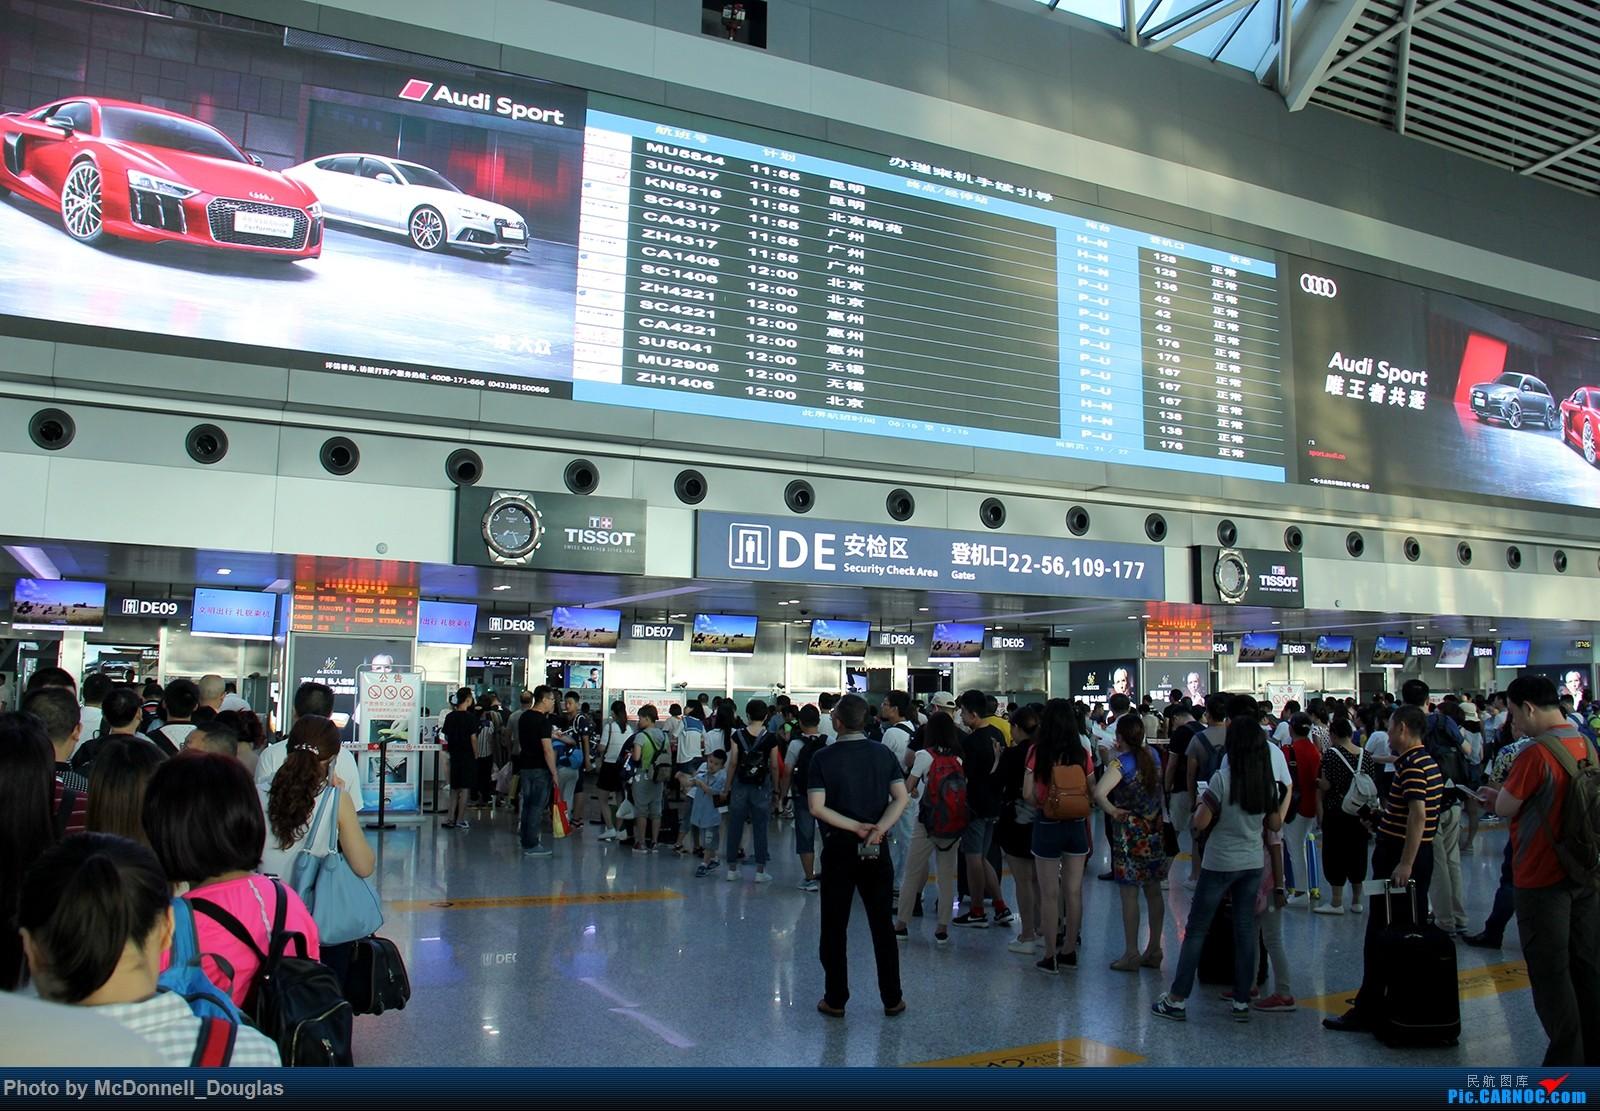 Re:[原创]【上海飞友会】【zc带你走天下(3)】再访祖辈年轻时工作的土地,父母年少时生活戈壁,跨越大半个中国去看新疆,回程小游蓉城(下)【已更至ARJ21详尽评测    中国成都双流国际机场